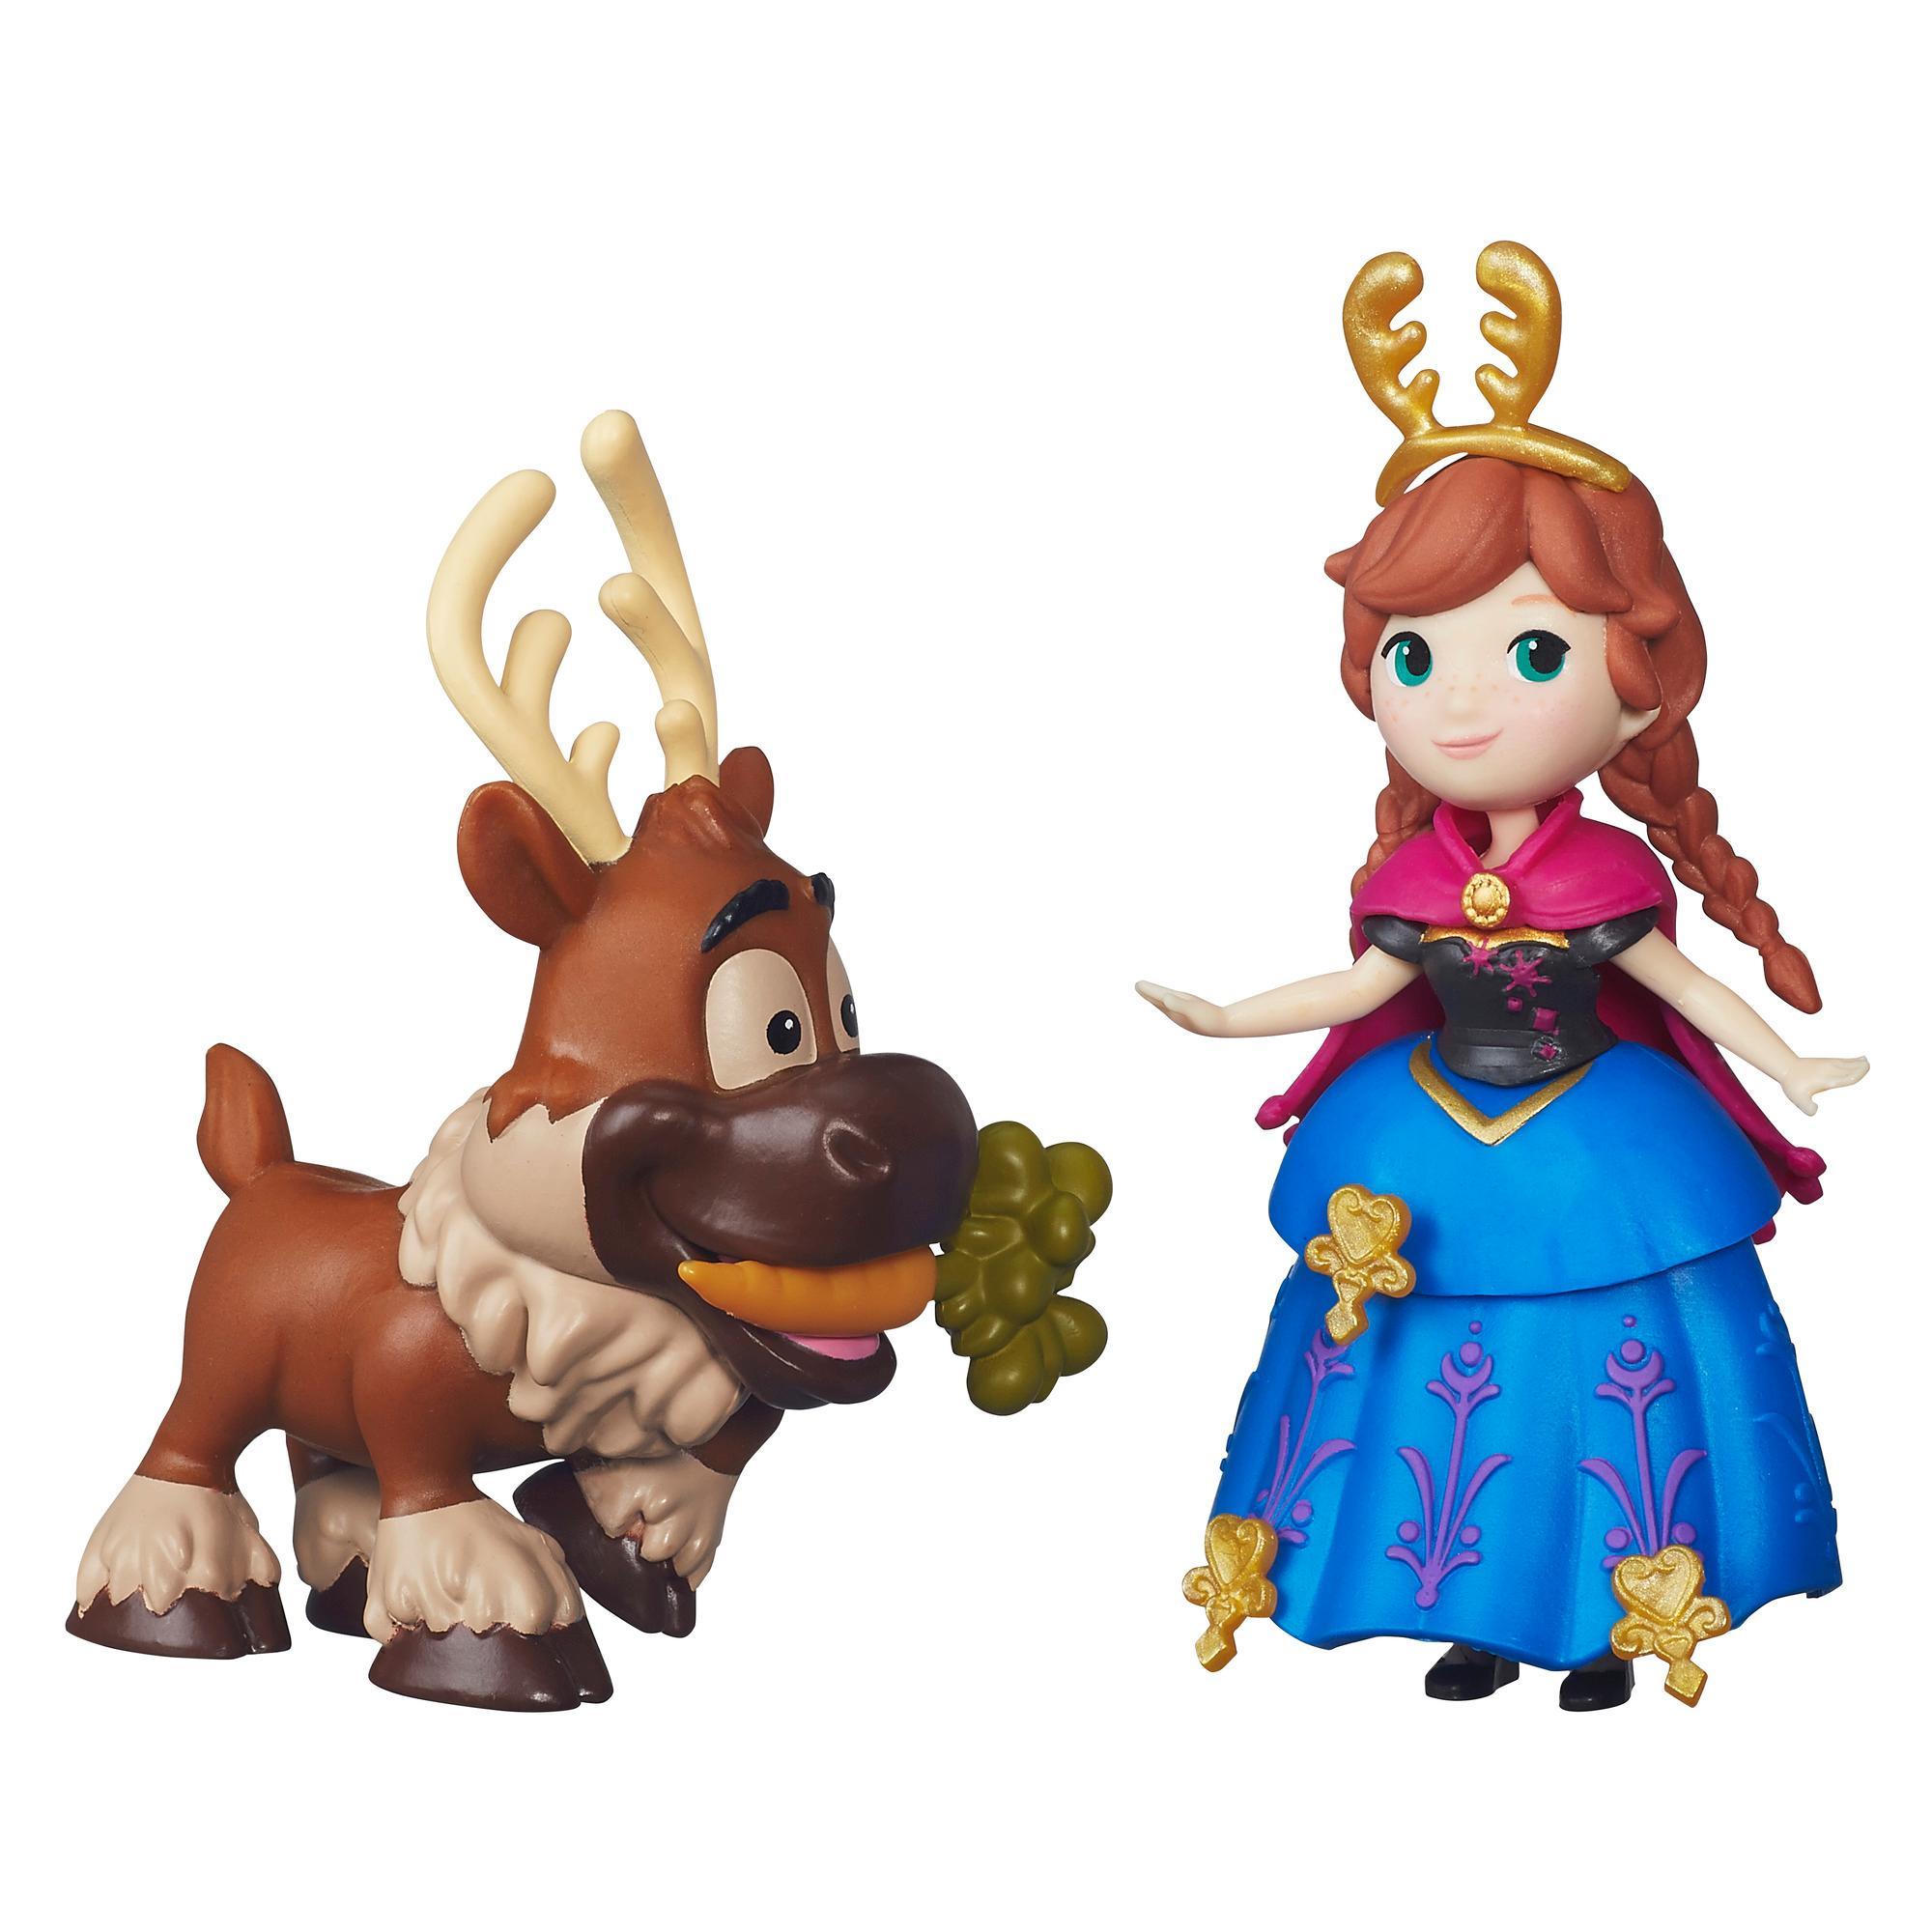 Disney Frozen Uma Aventura Congelante Pequeno Reino Anna & Sven